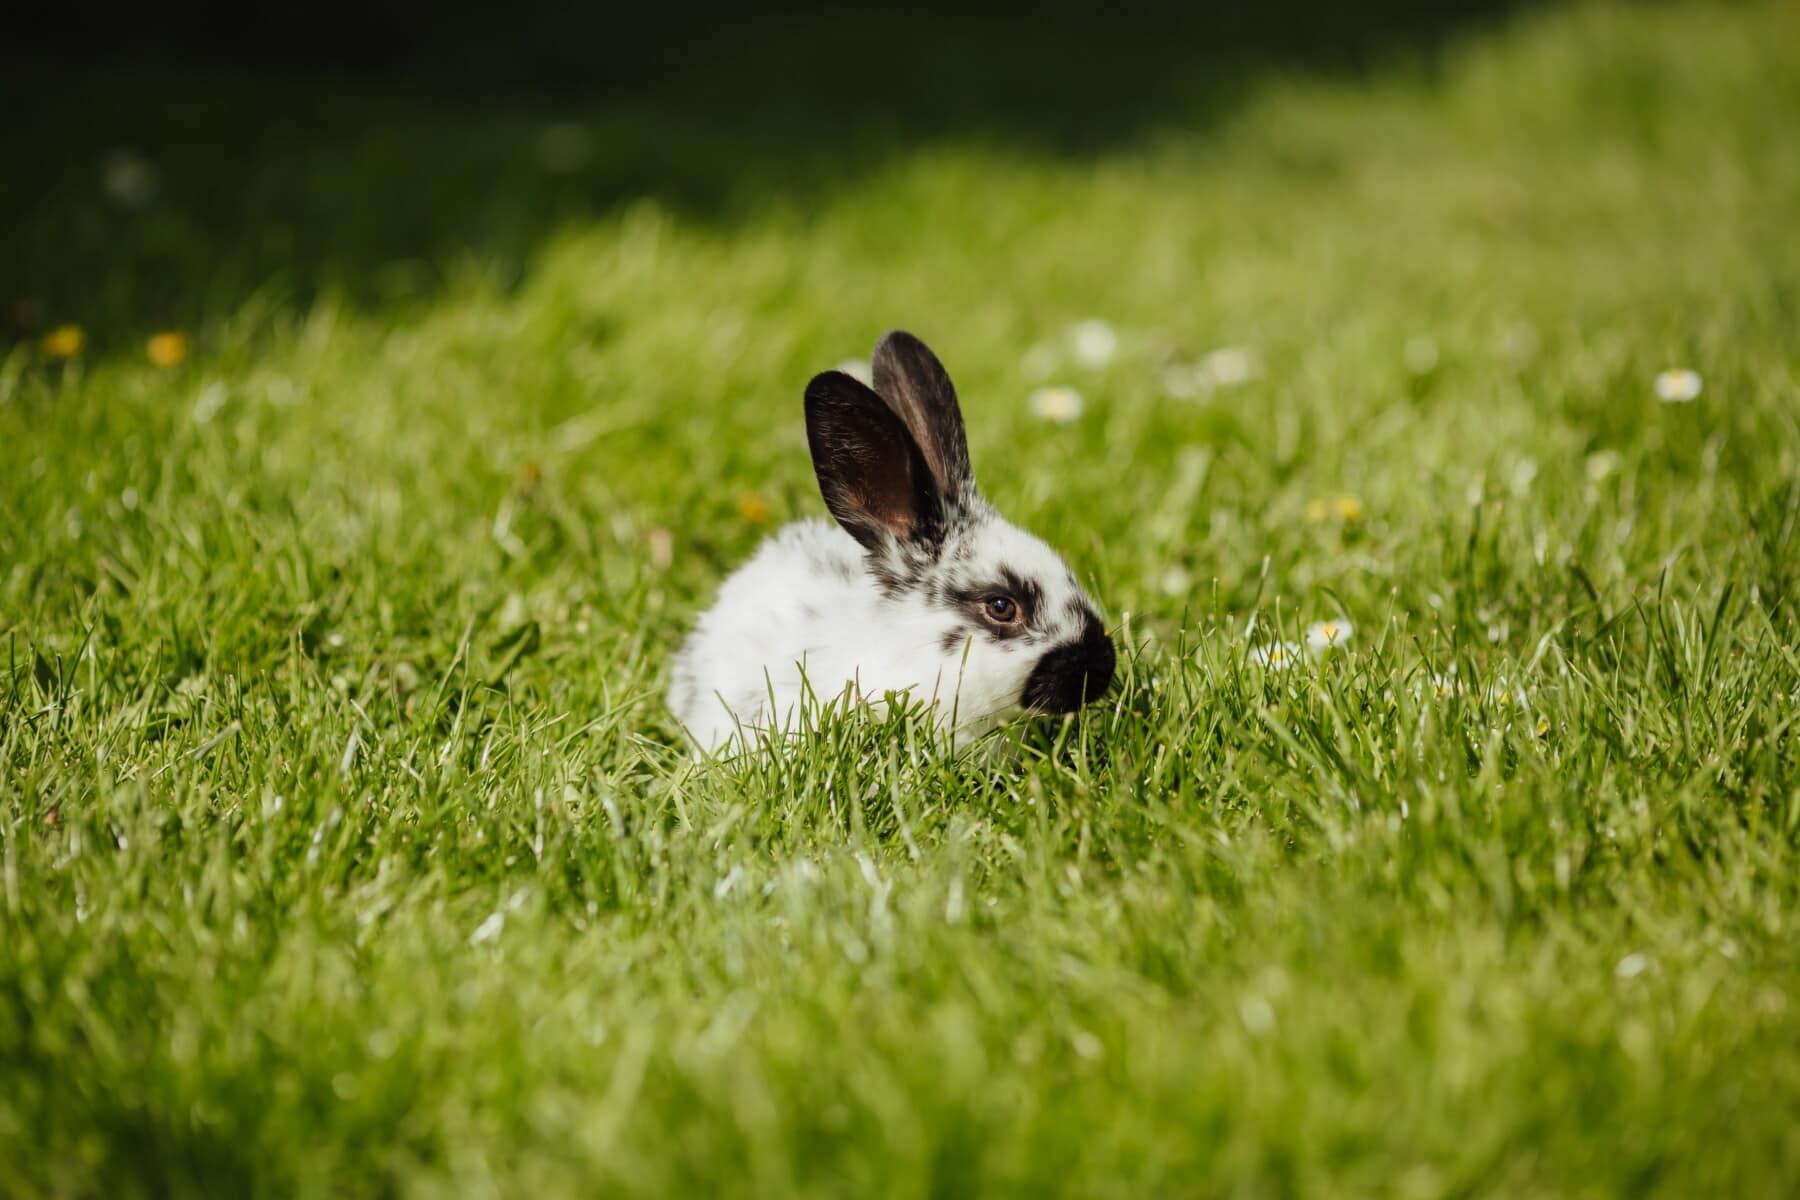 rabbit, domestic, bunny, animal, easter, grass, pet, fur, cute, nature